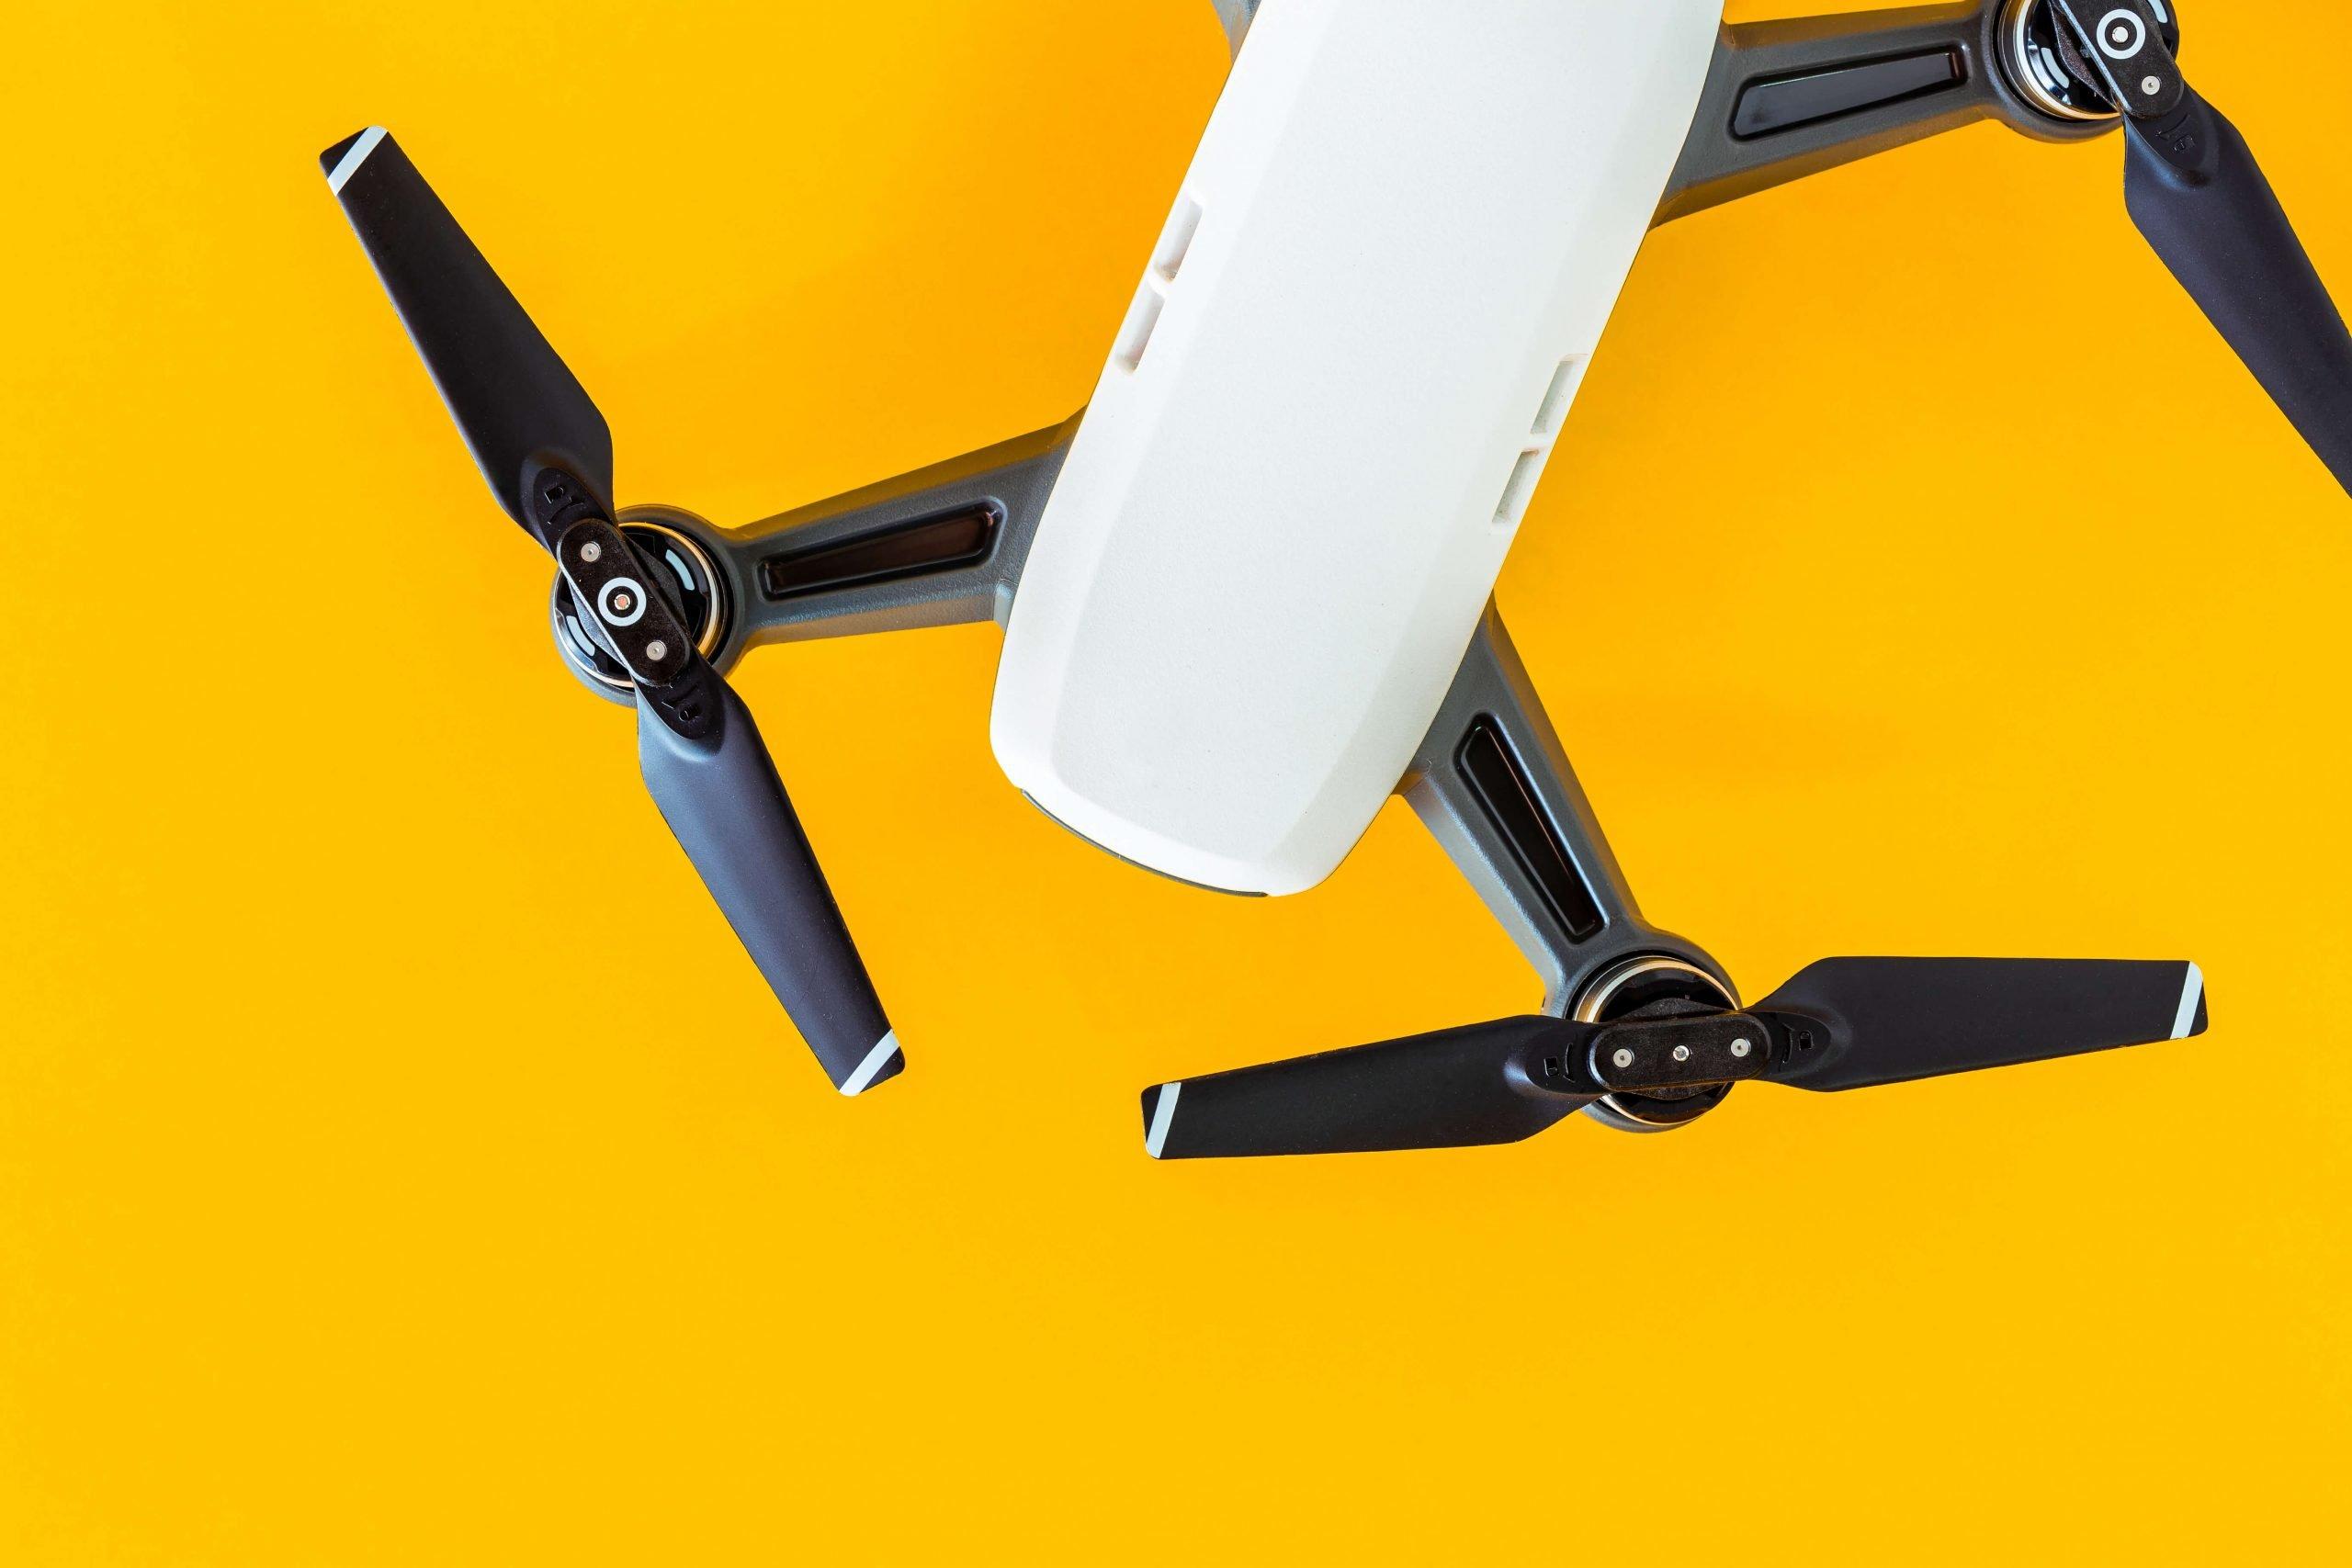 Drone maximum Flight time